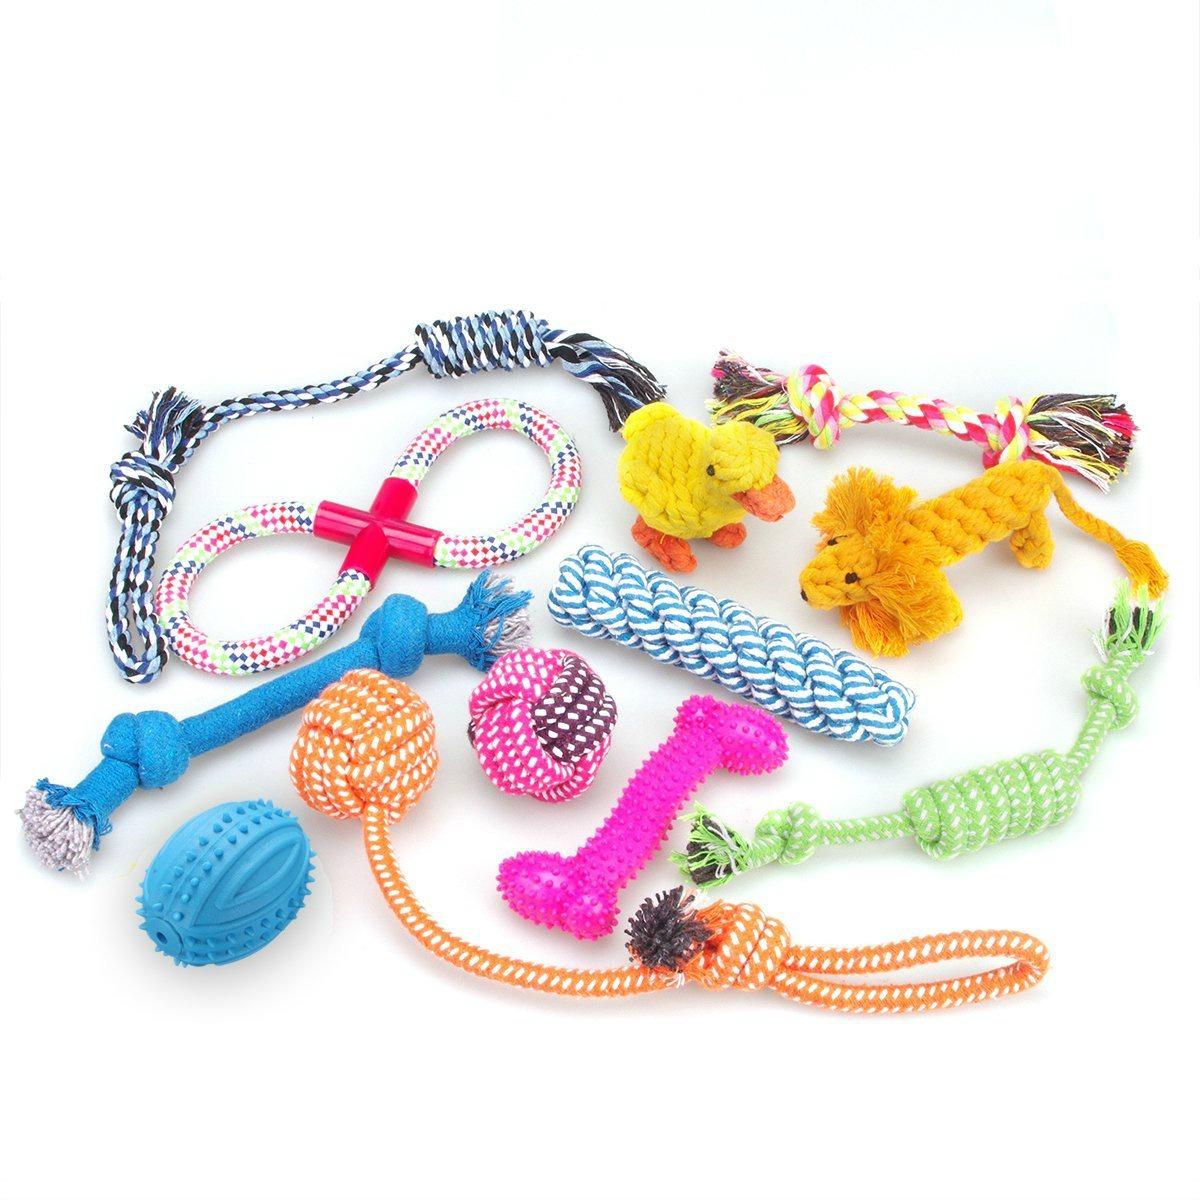 lote de juguetes para perros